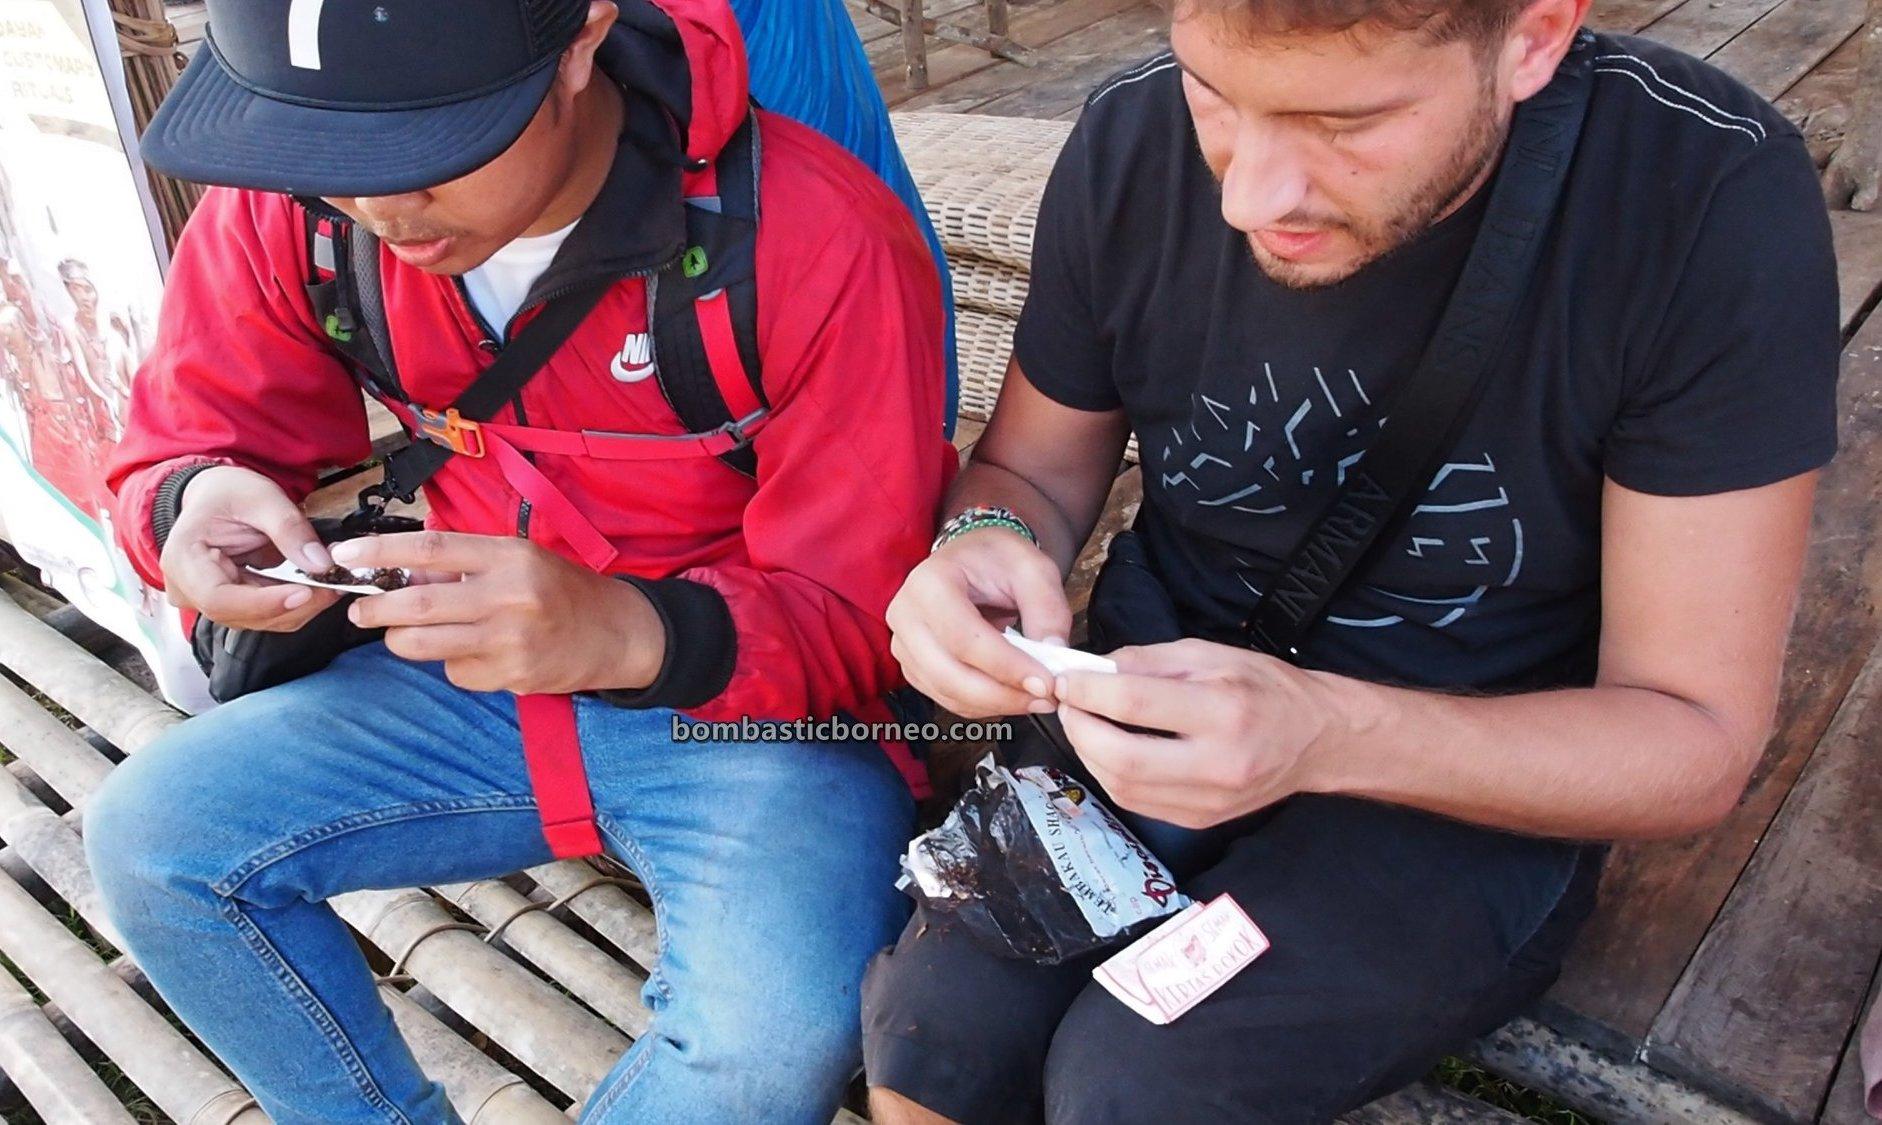 Nyobeng Sebujit, Gawai Harvest Festival, village, budaya, event, Bengkayang, Indonesia, Desa Hli Buei, Siding, Ethnic, native, Obyek wisata, Tourism, travel guide, Cross Border, Borneo